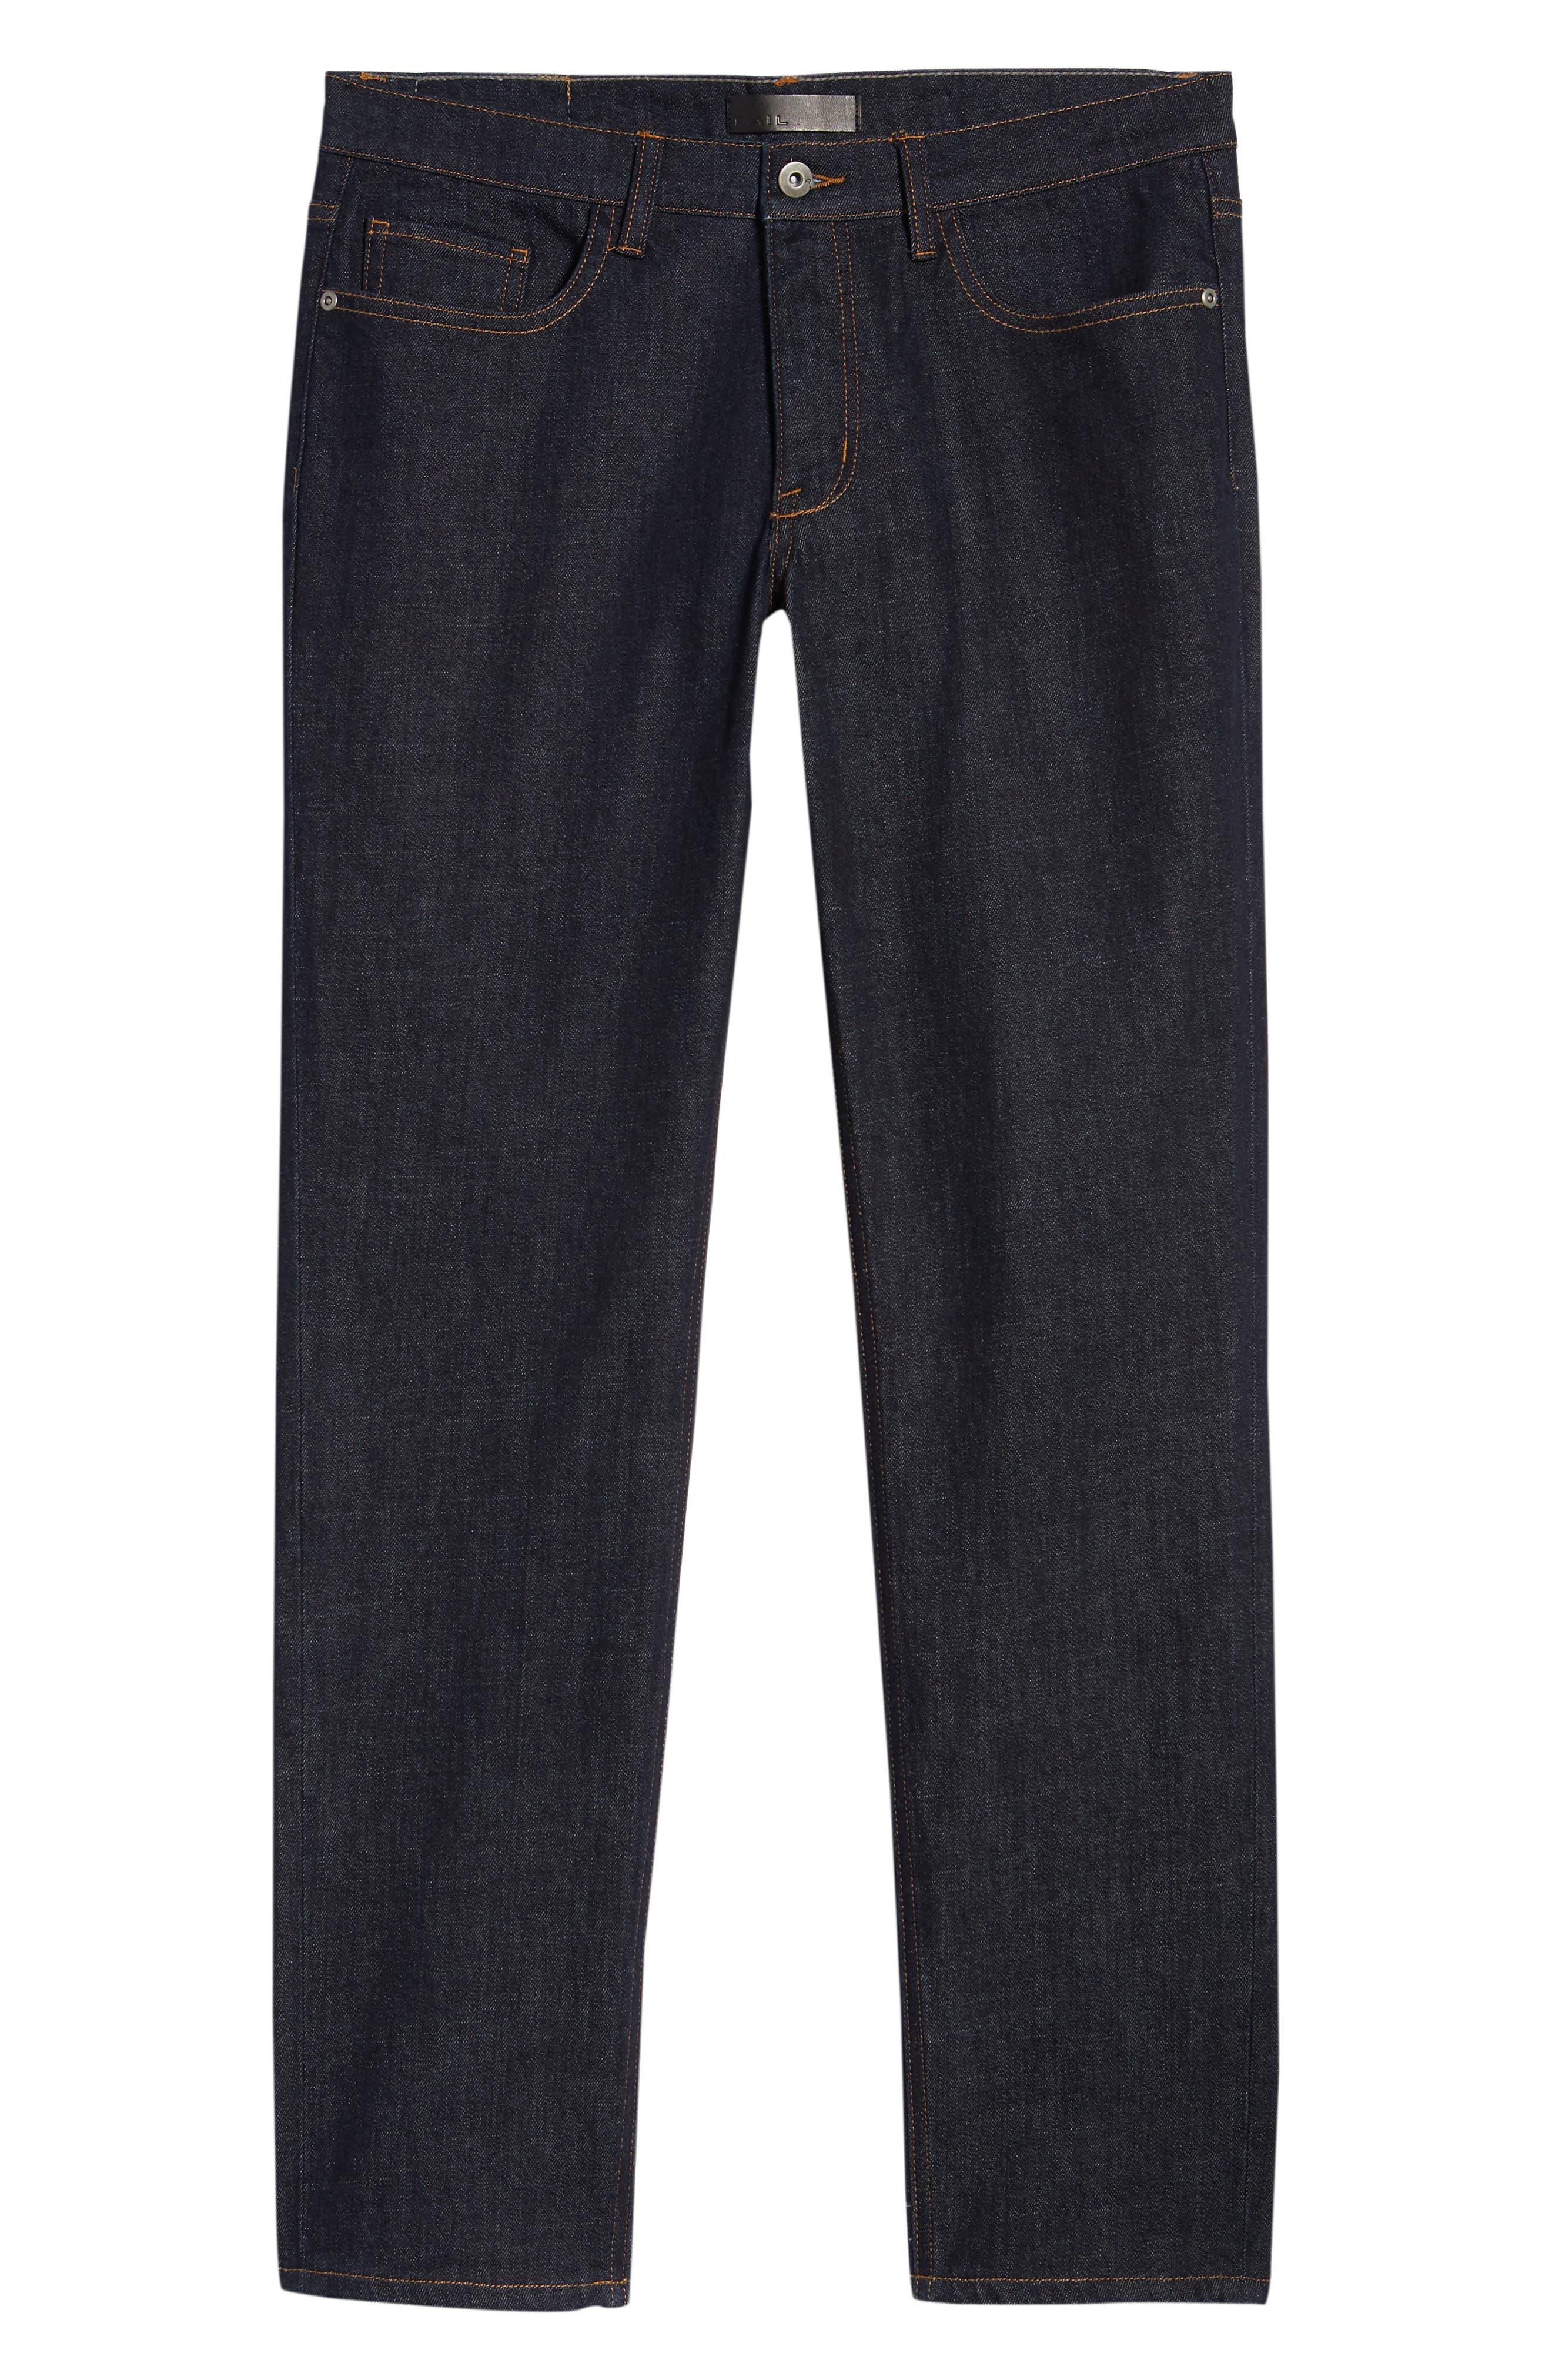 THE RAIL, Stretch Slim Leg Jeans, Alternate thumbnail 7, color, BLUE PERRY WASH